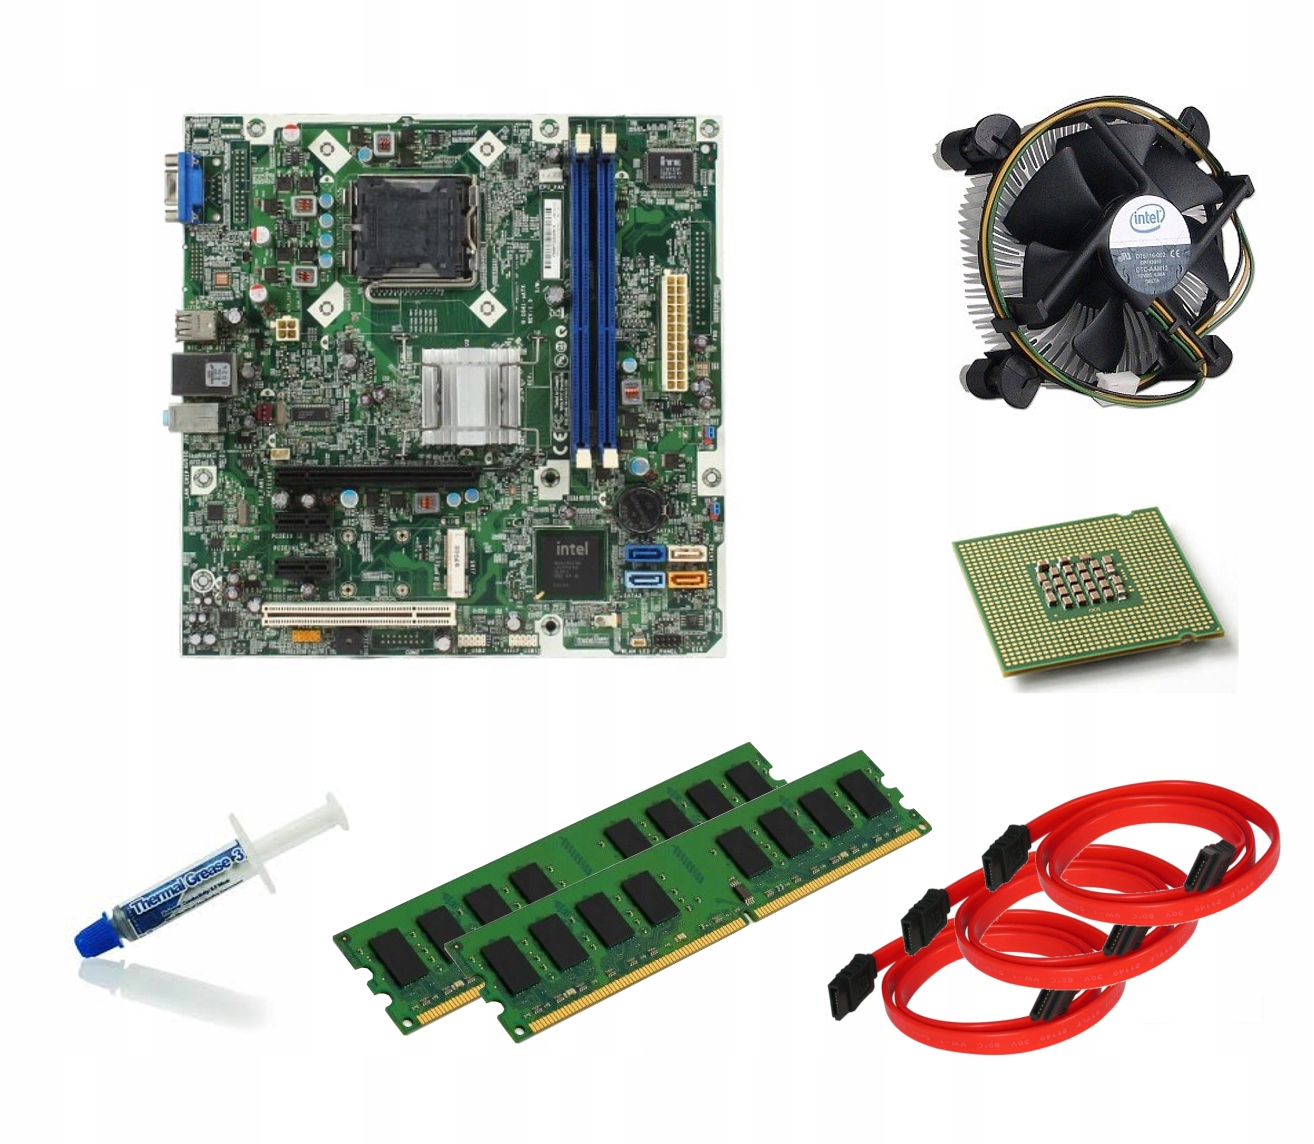 ZESTAW PŁYTA +QUAD CORE 4x2.5 +4GB DDR3 COOLER ++